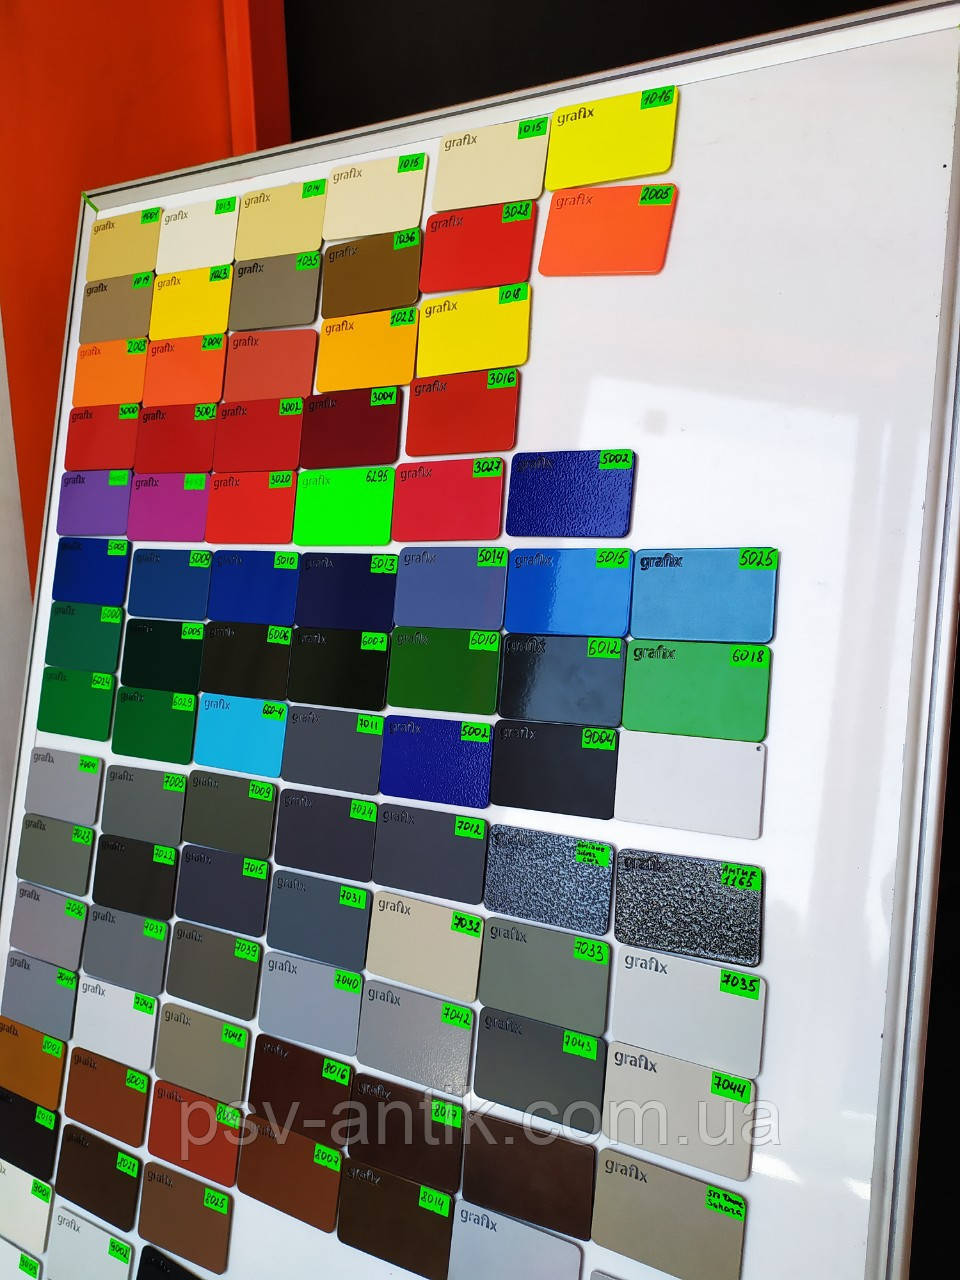 Порошковая краска глянцевая, полиэфирная, архитектурная, 9004